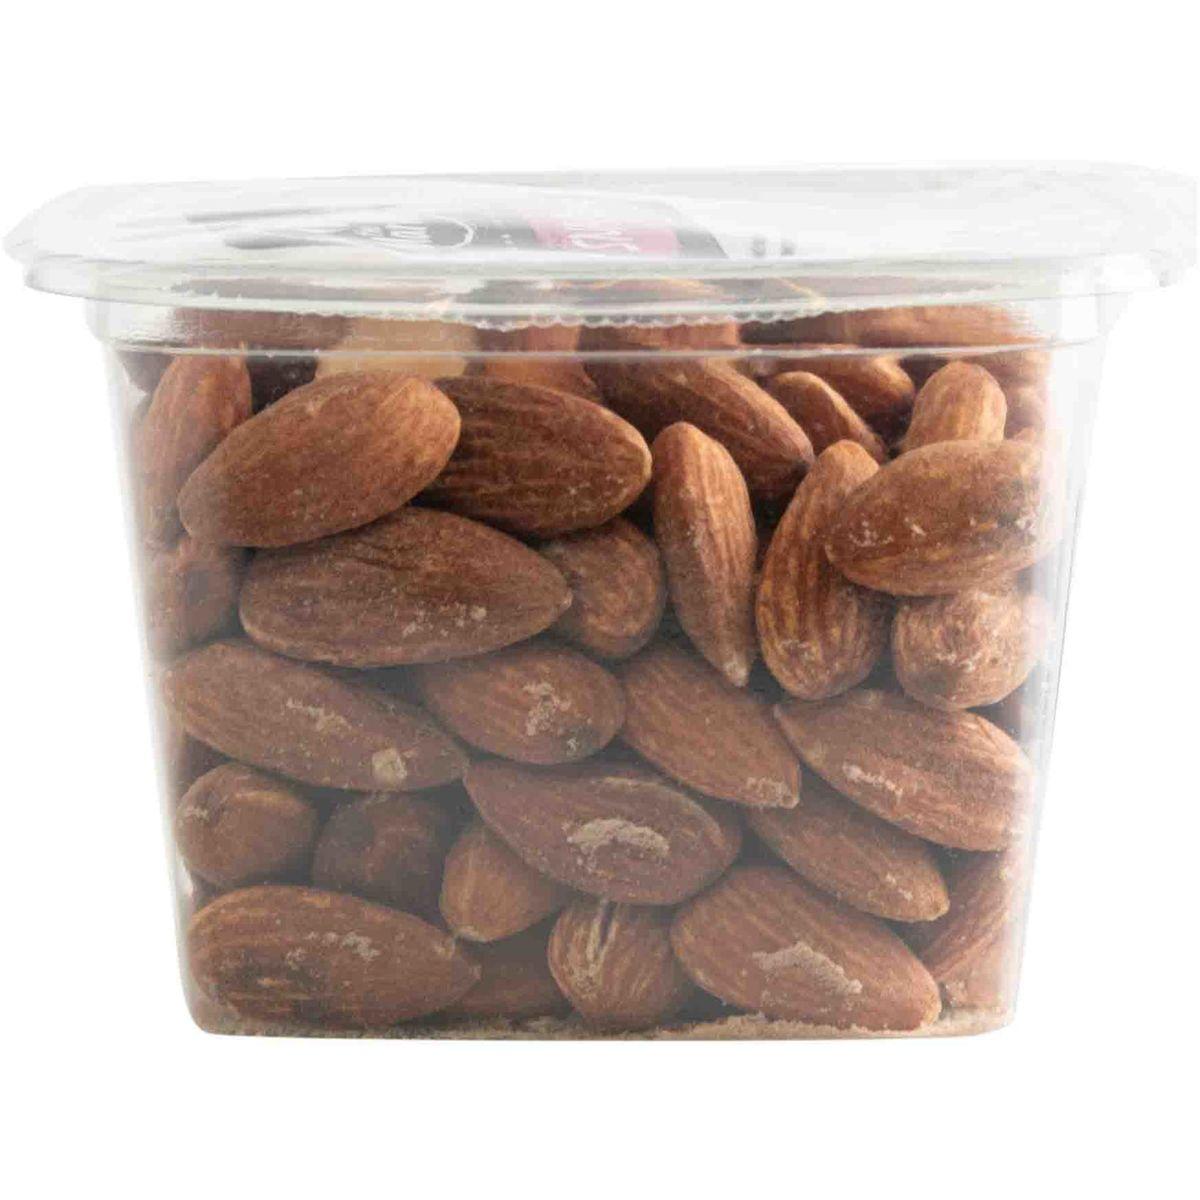 Carrefour Nuts & Fruits Snacking Amandes Grillées & Salées 200 g